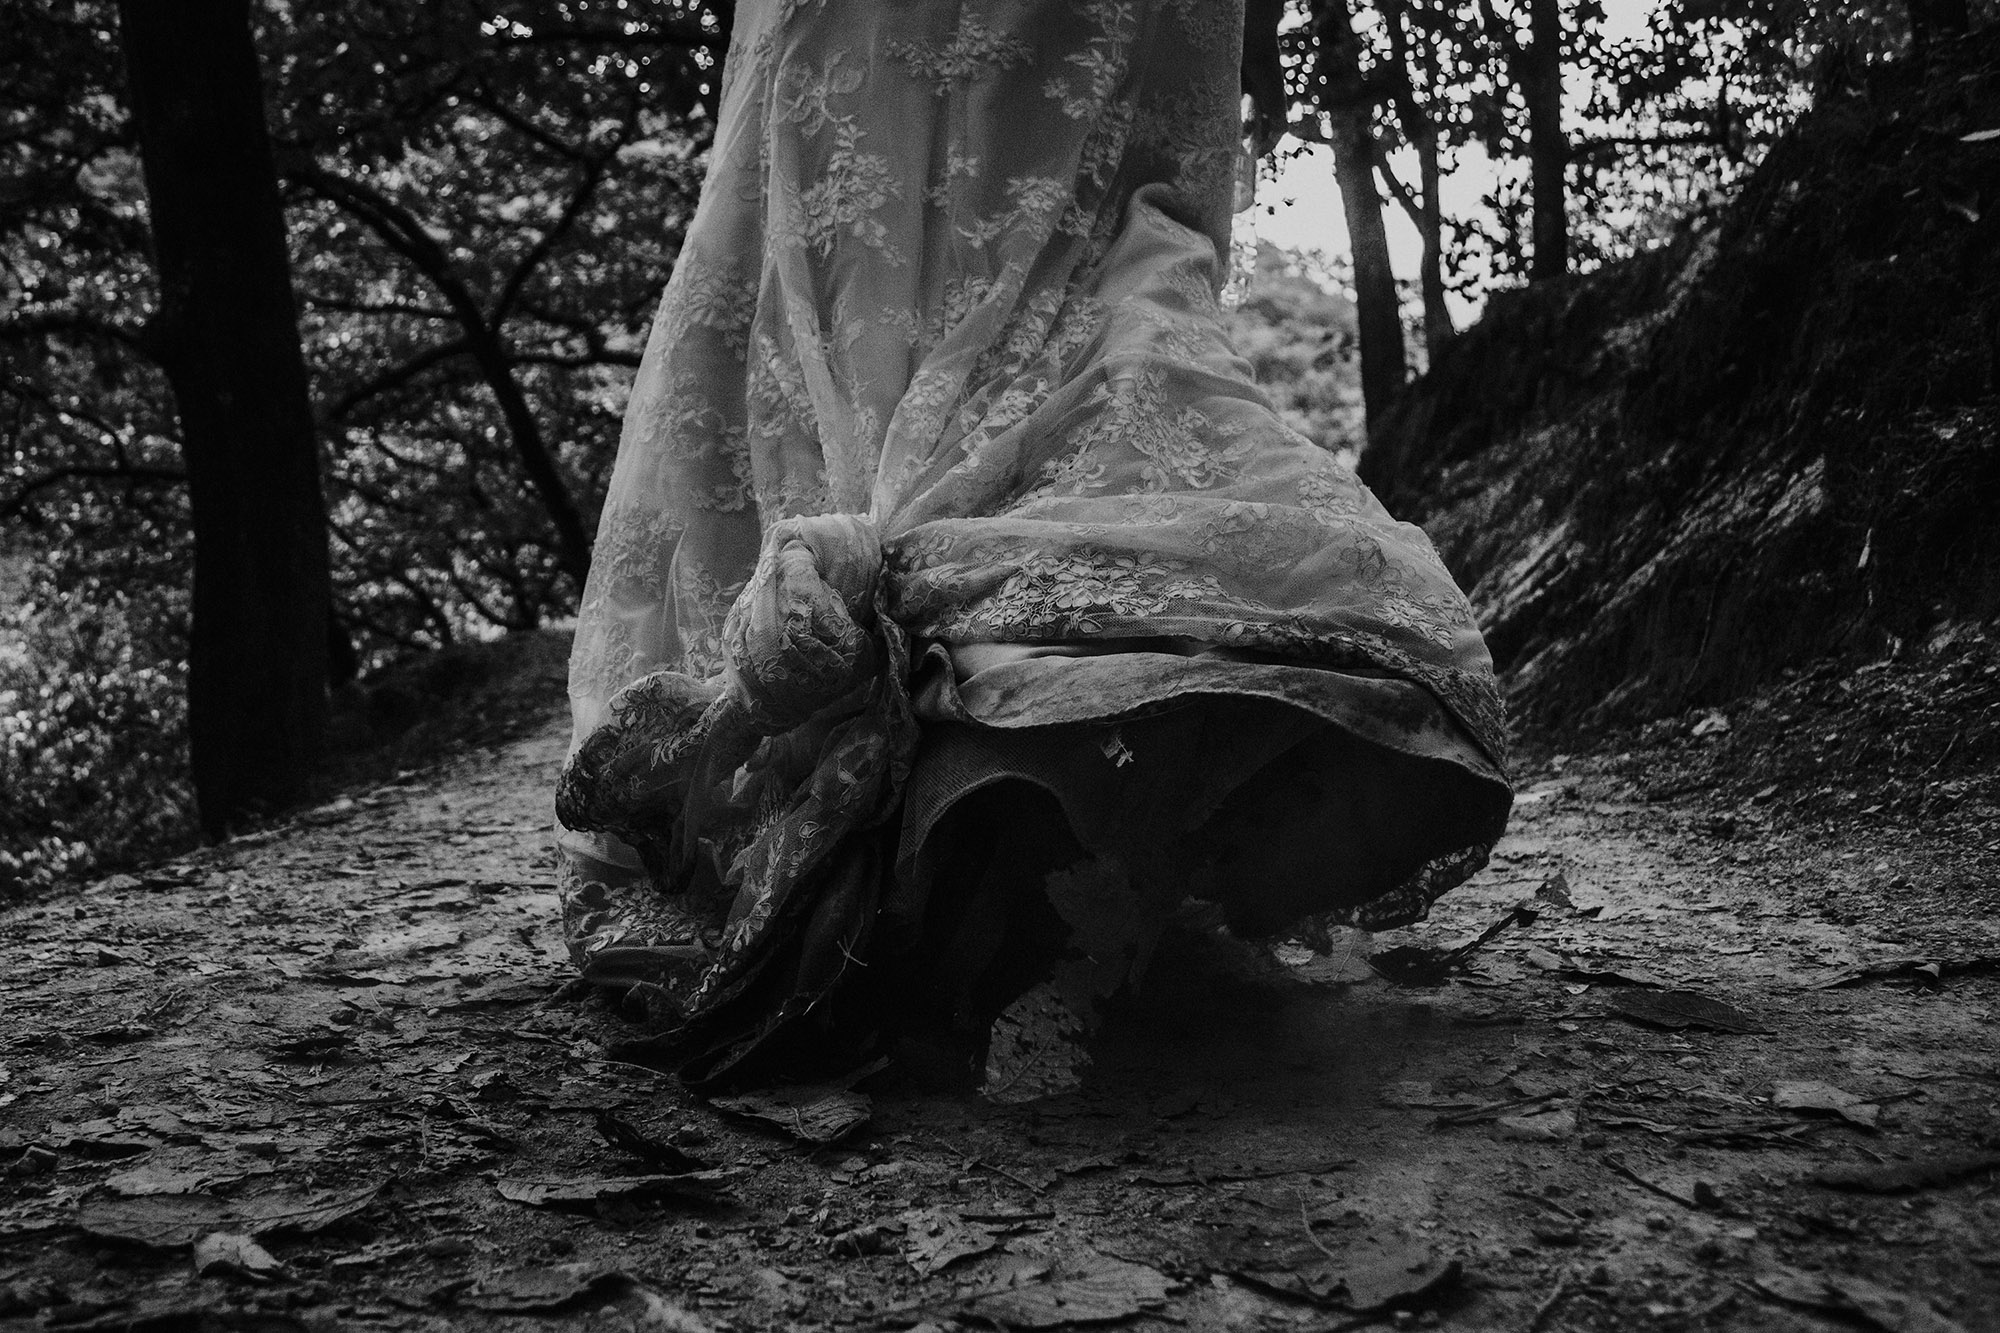 fer juan luis trash the dress fotografo de bodas 13.jpg